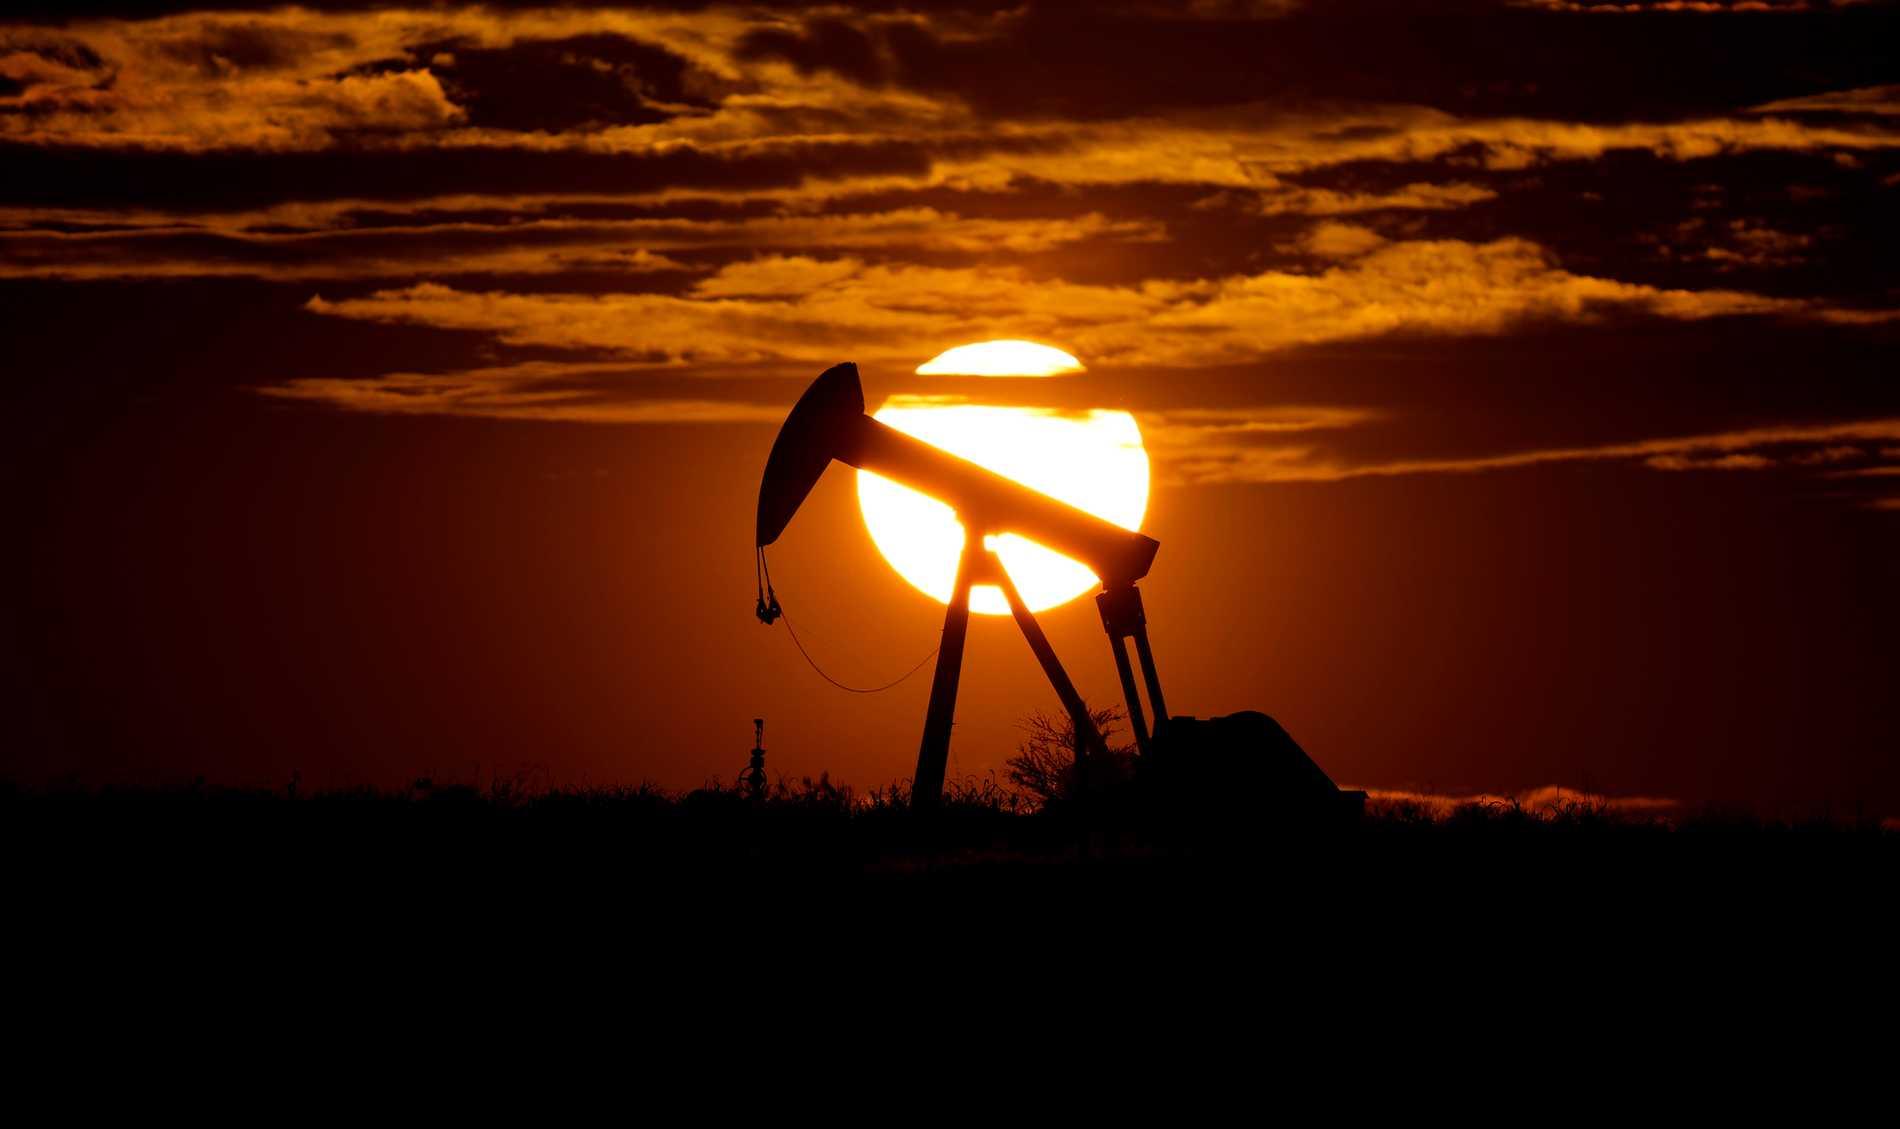 Efter oljeavtalet – priset på råolja sjunker